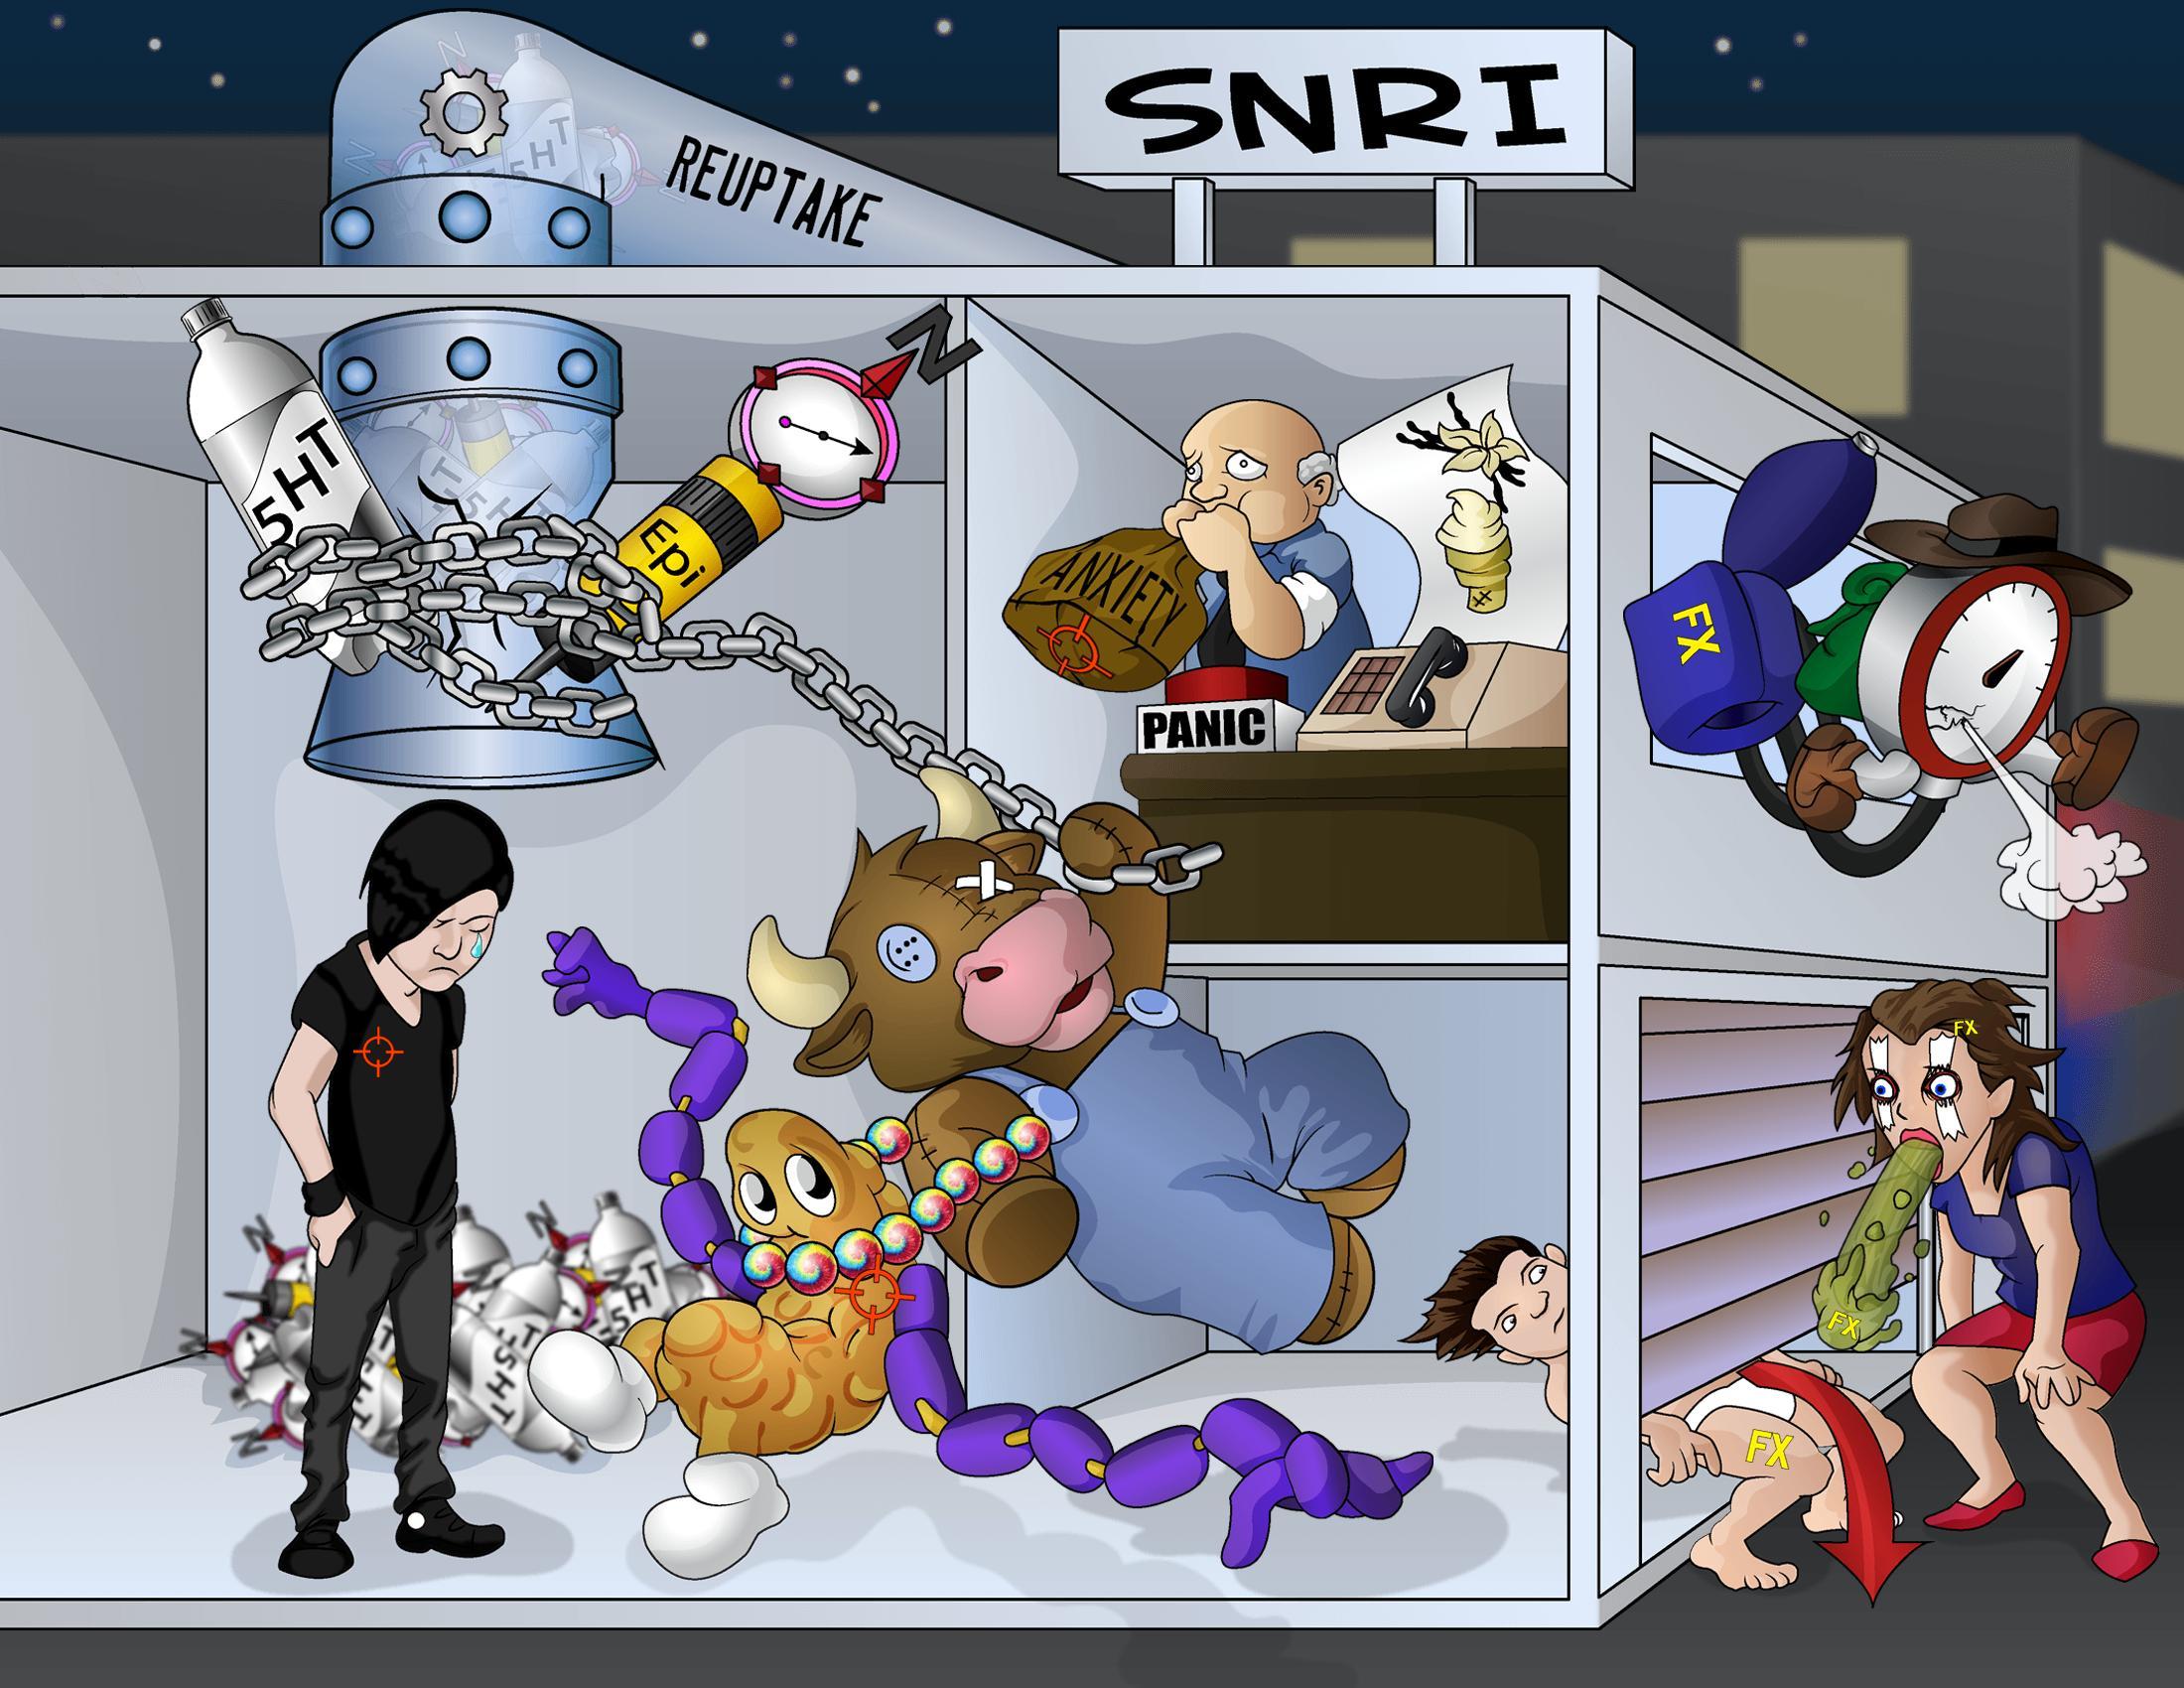 Serotonin Norepinephrine Reuptake Inhibitors (SNRIs)